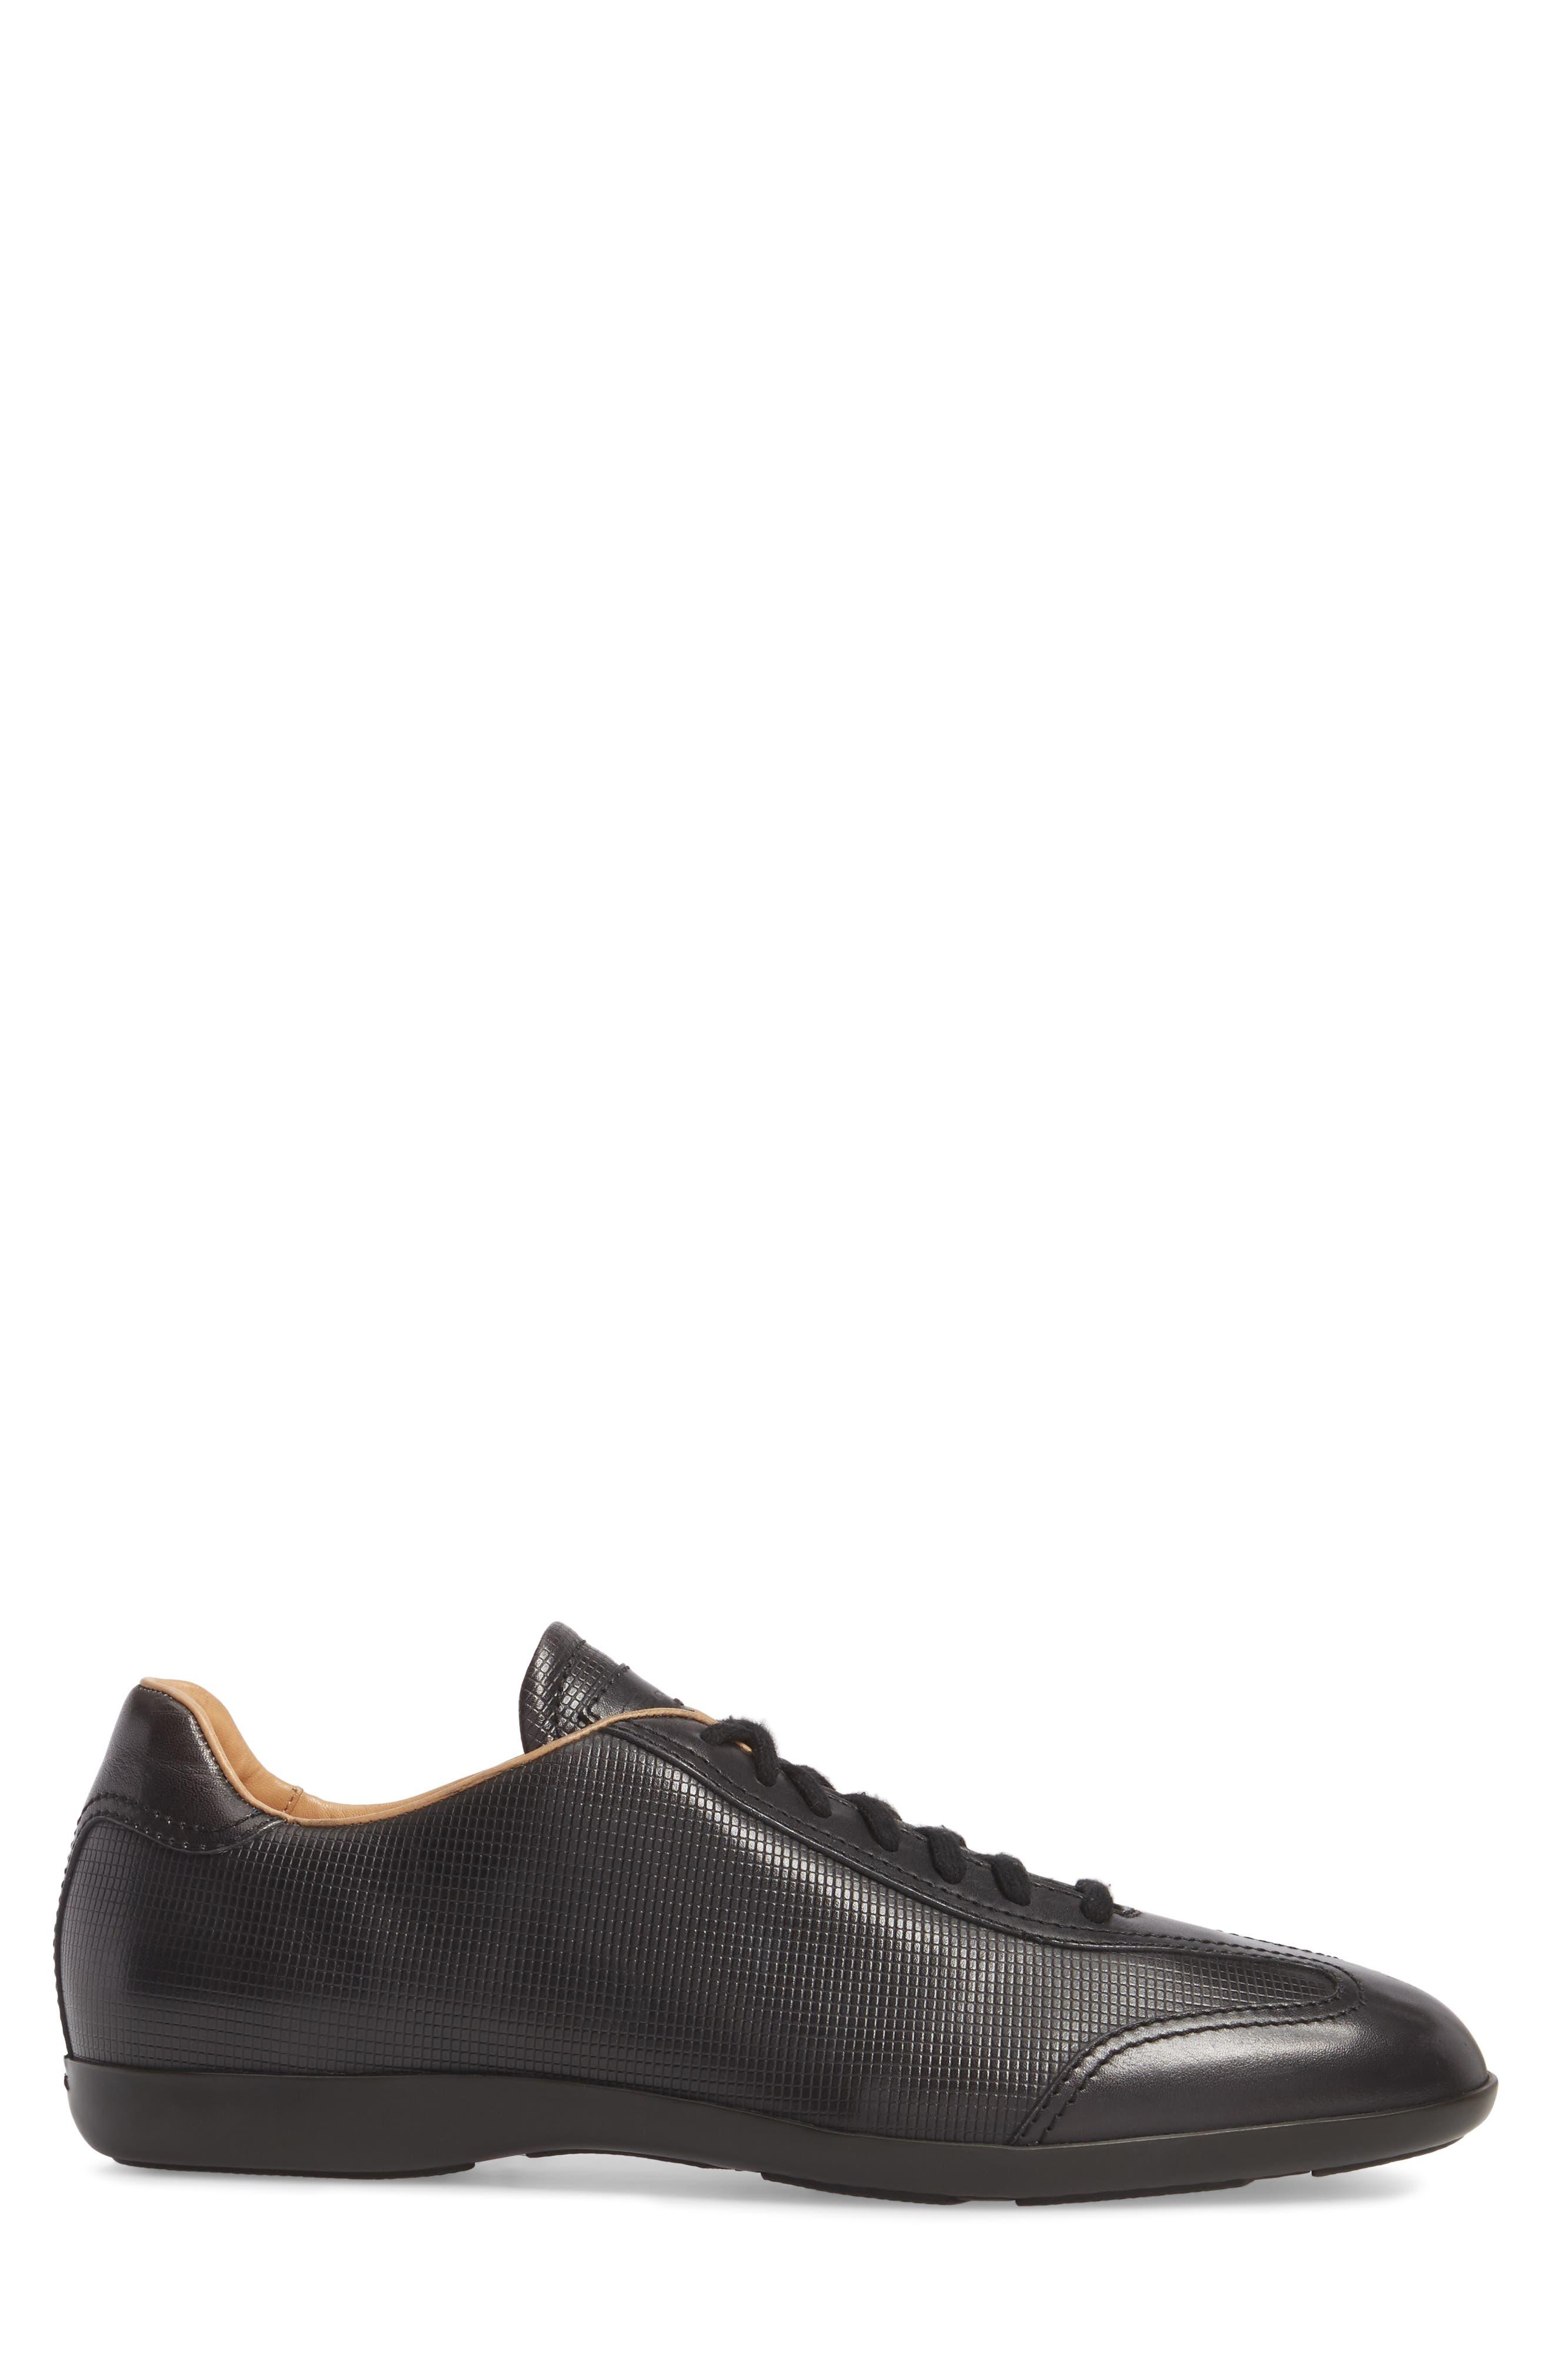 'Cortez' Sneaker,                             Alternate thumbnail 3, color,                             Brown Leather